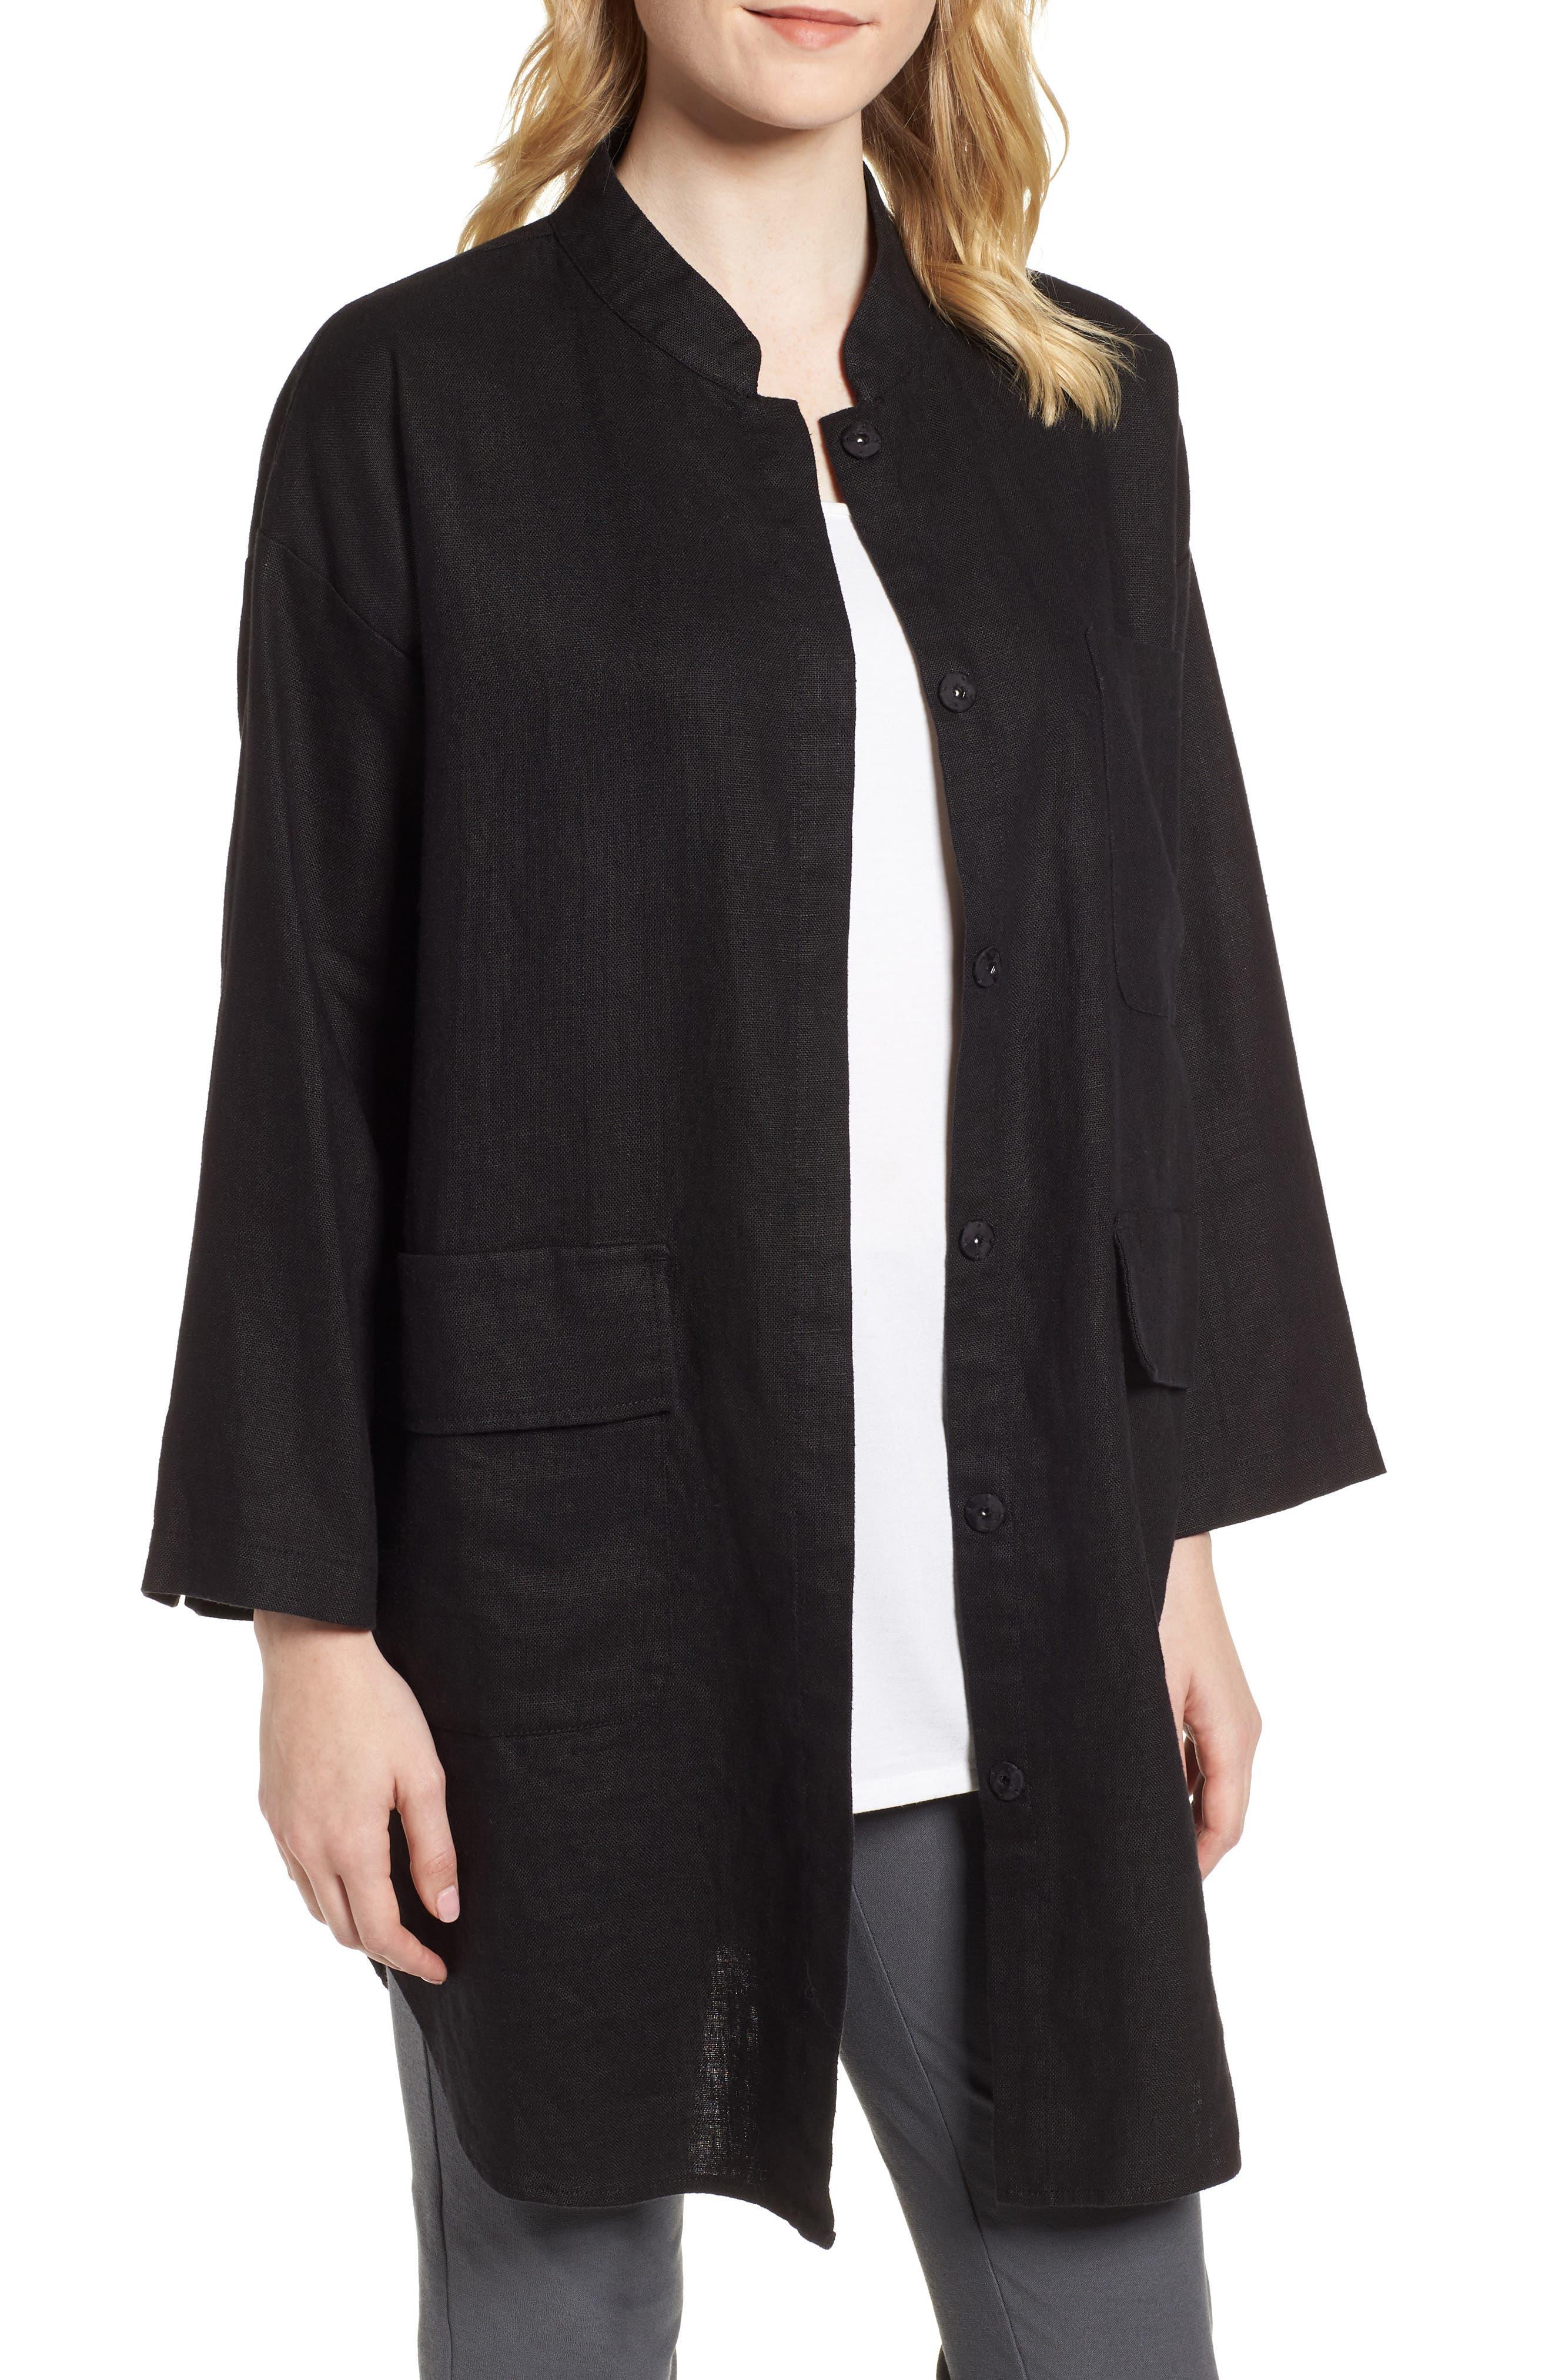 Organic Linen Jacket,                             Main thumbnail 1, color,                             001